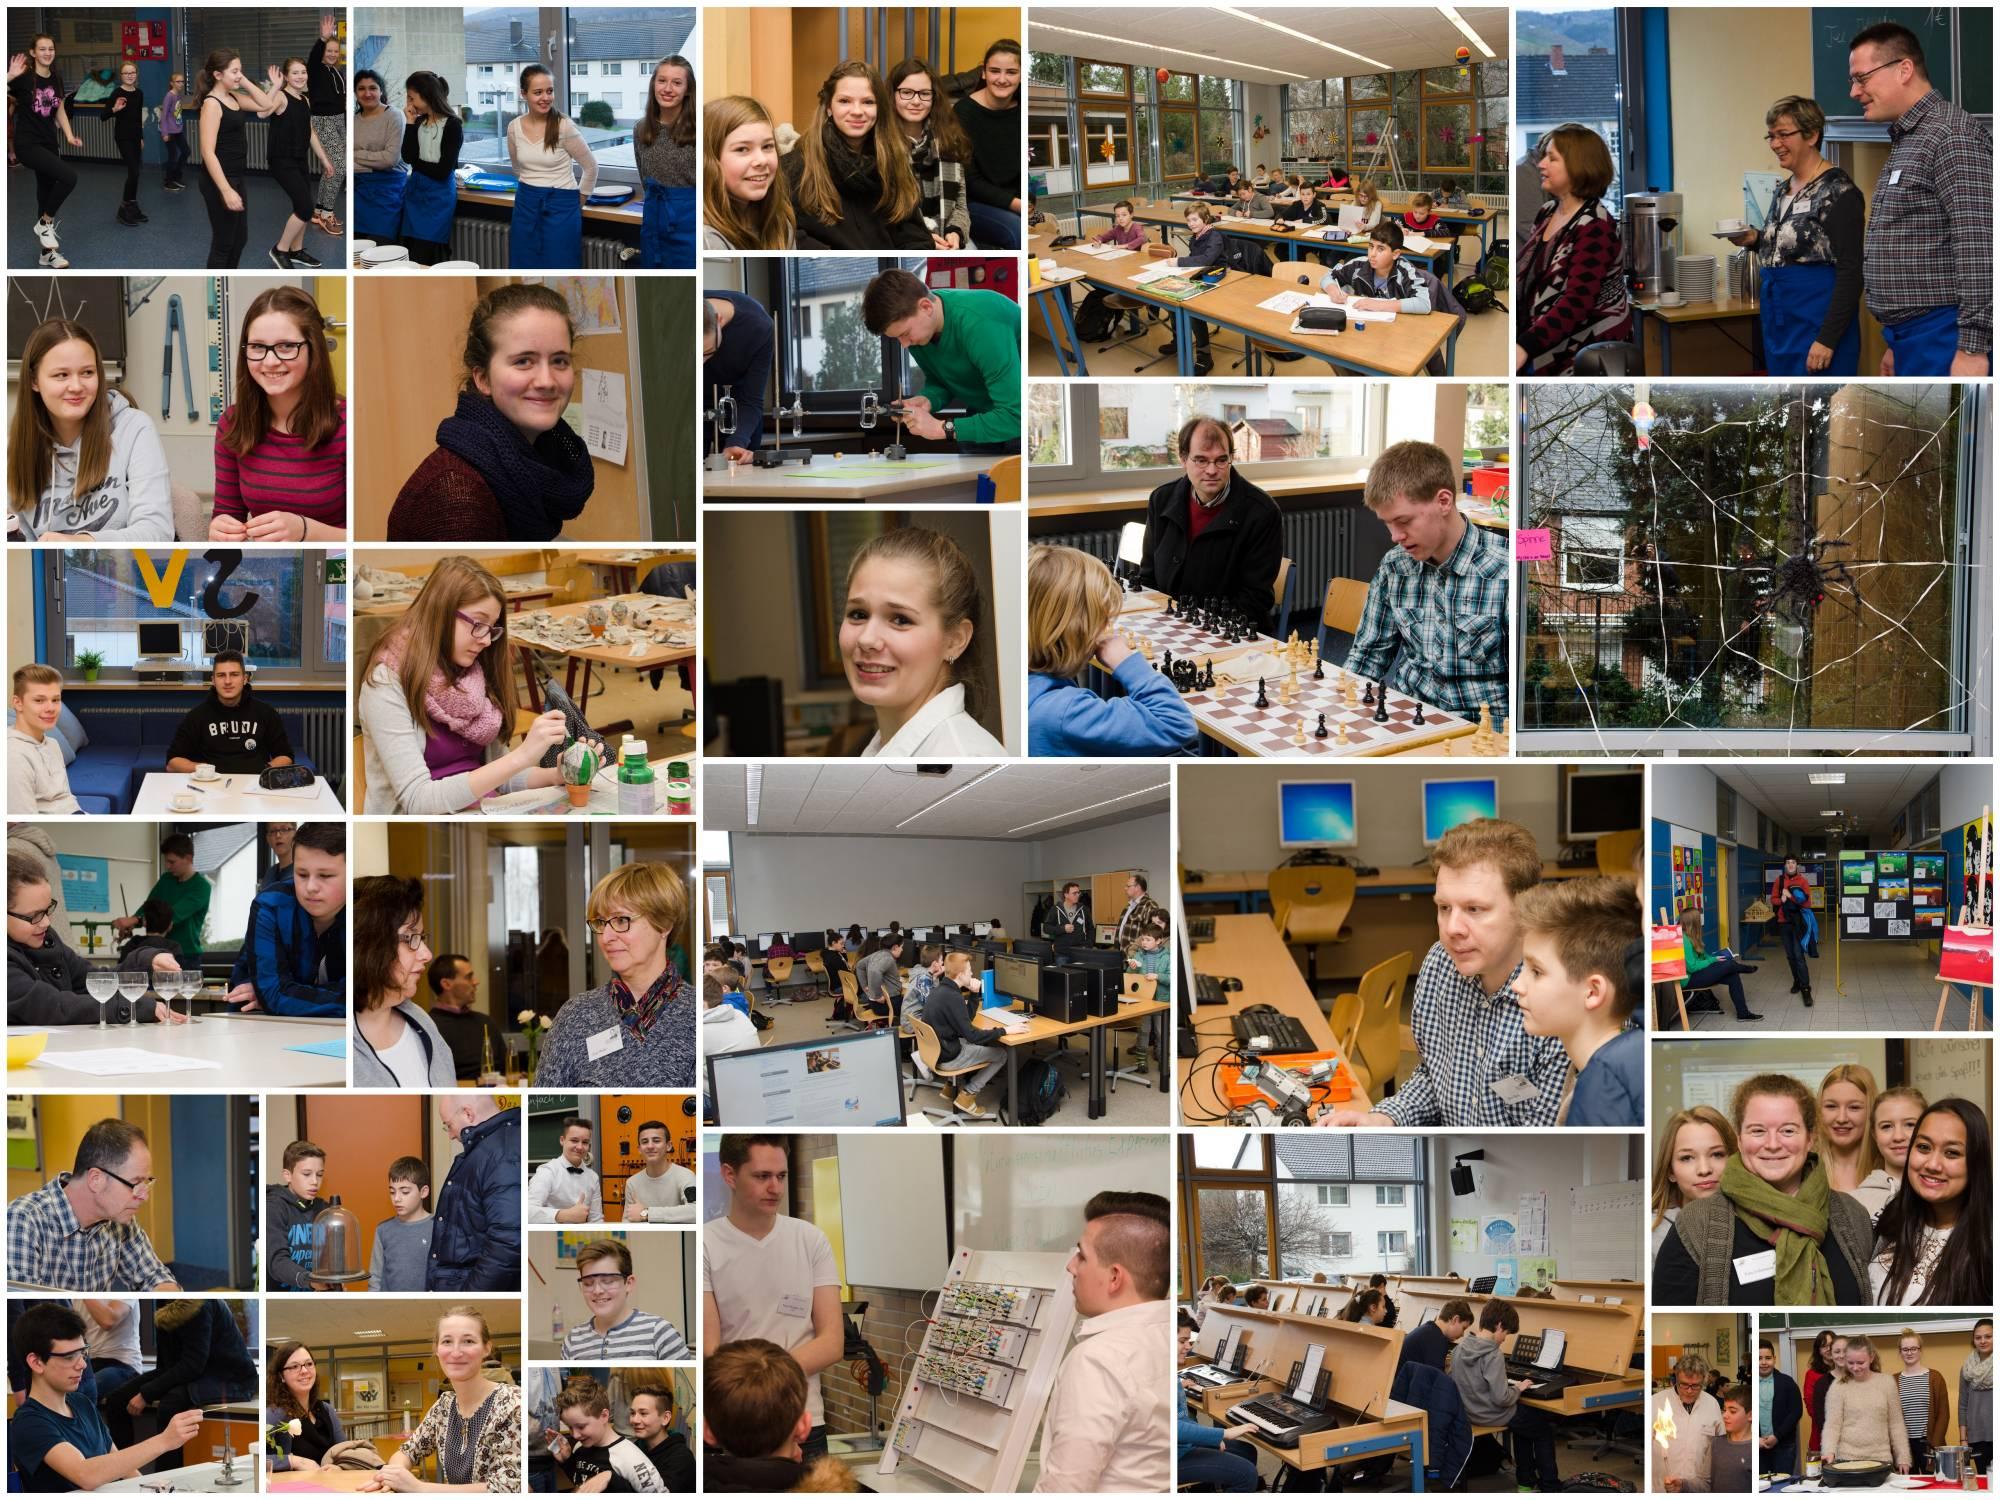 Schule öffnete sich: Jede Menge los in alle Räumen der Boeselager-Realschule Ahrweiler